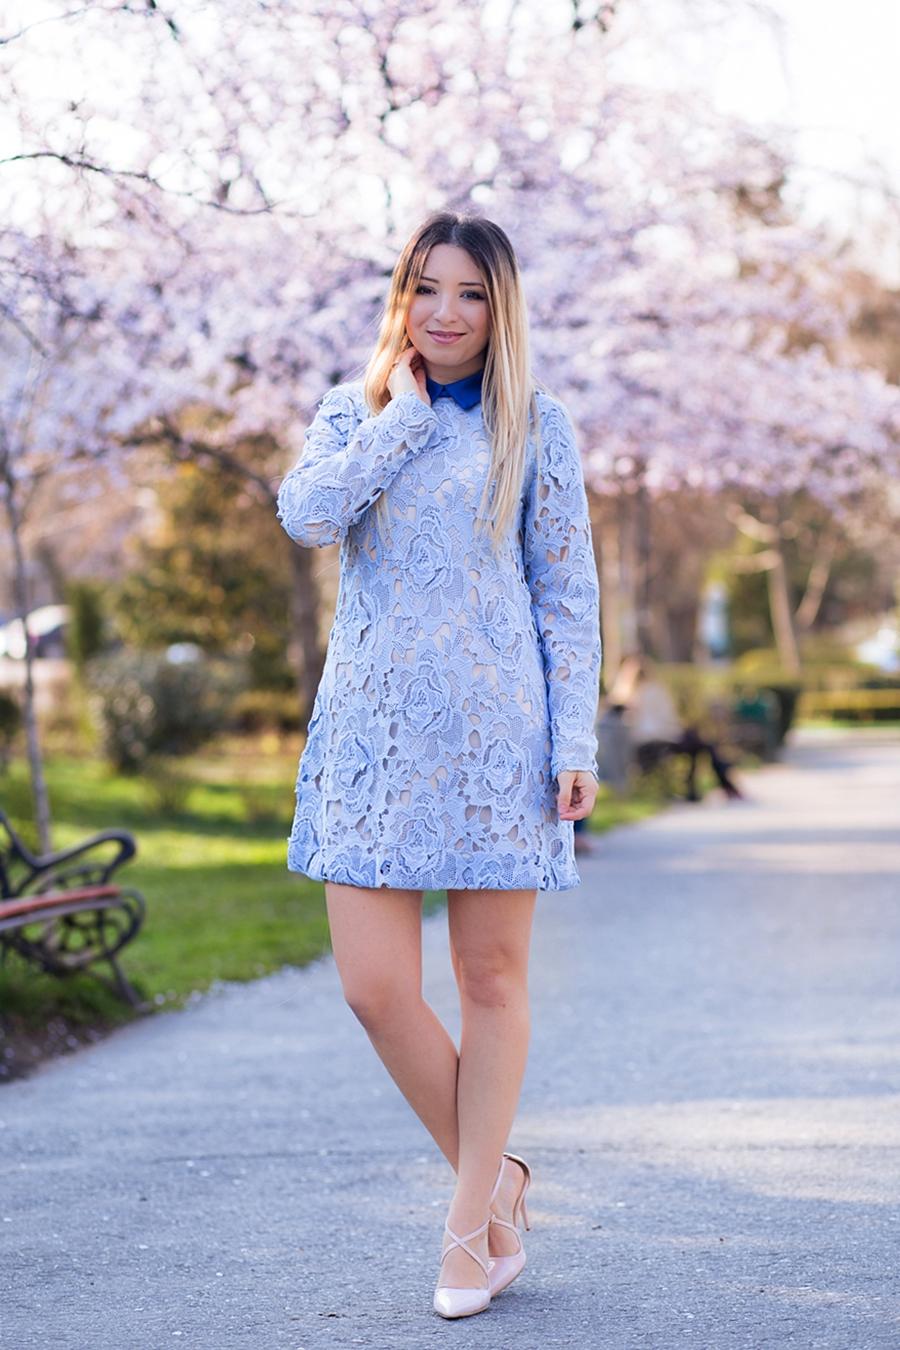 Andreea Pantilinescu - cum purtam rochia din dantela albastra, bleu serenity? Tendinte in moda. Tinuta de primavara copaci infloriti